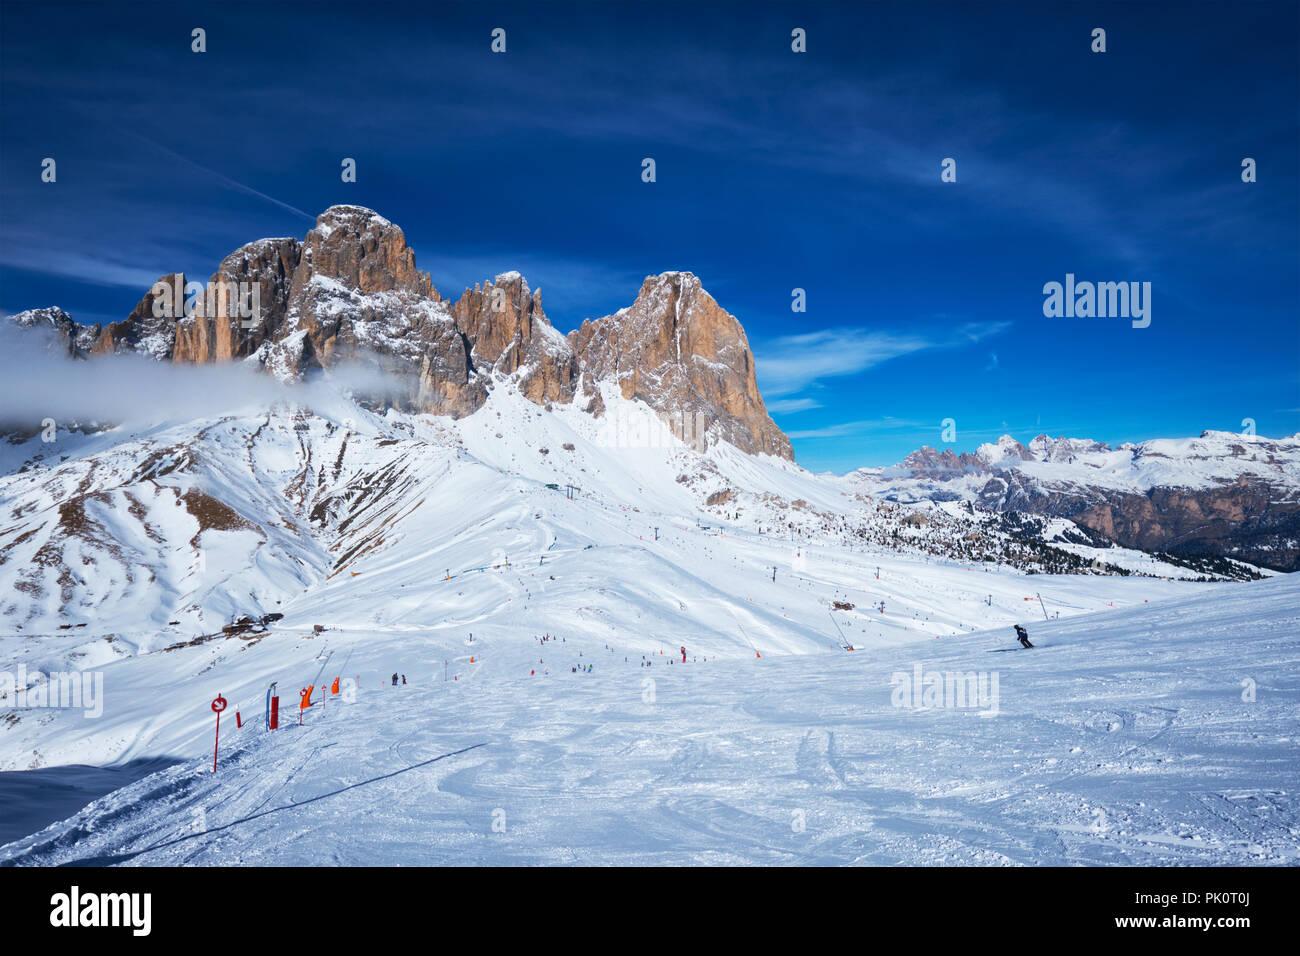 Station de ski à Dolomites, Italie Photo Stock